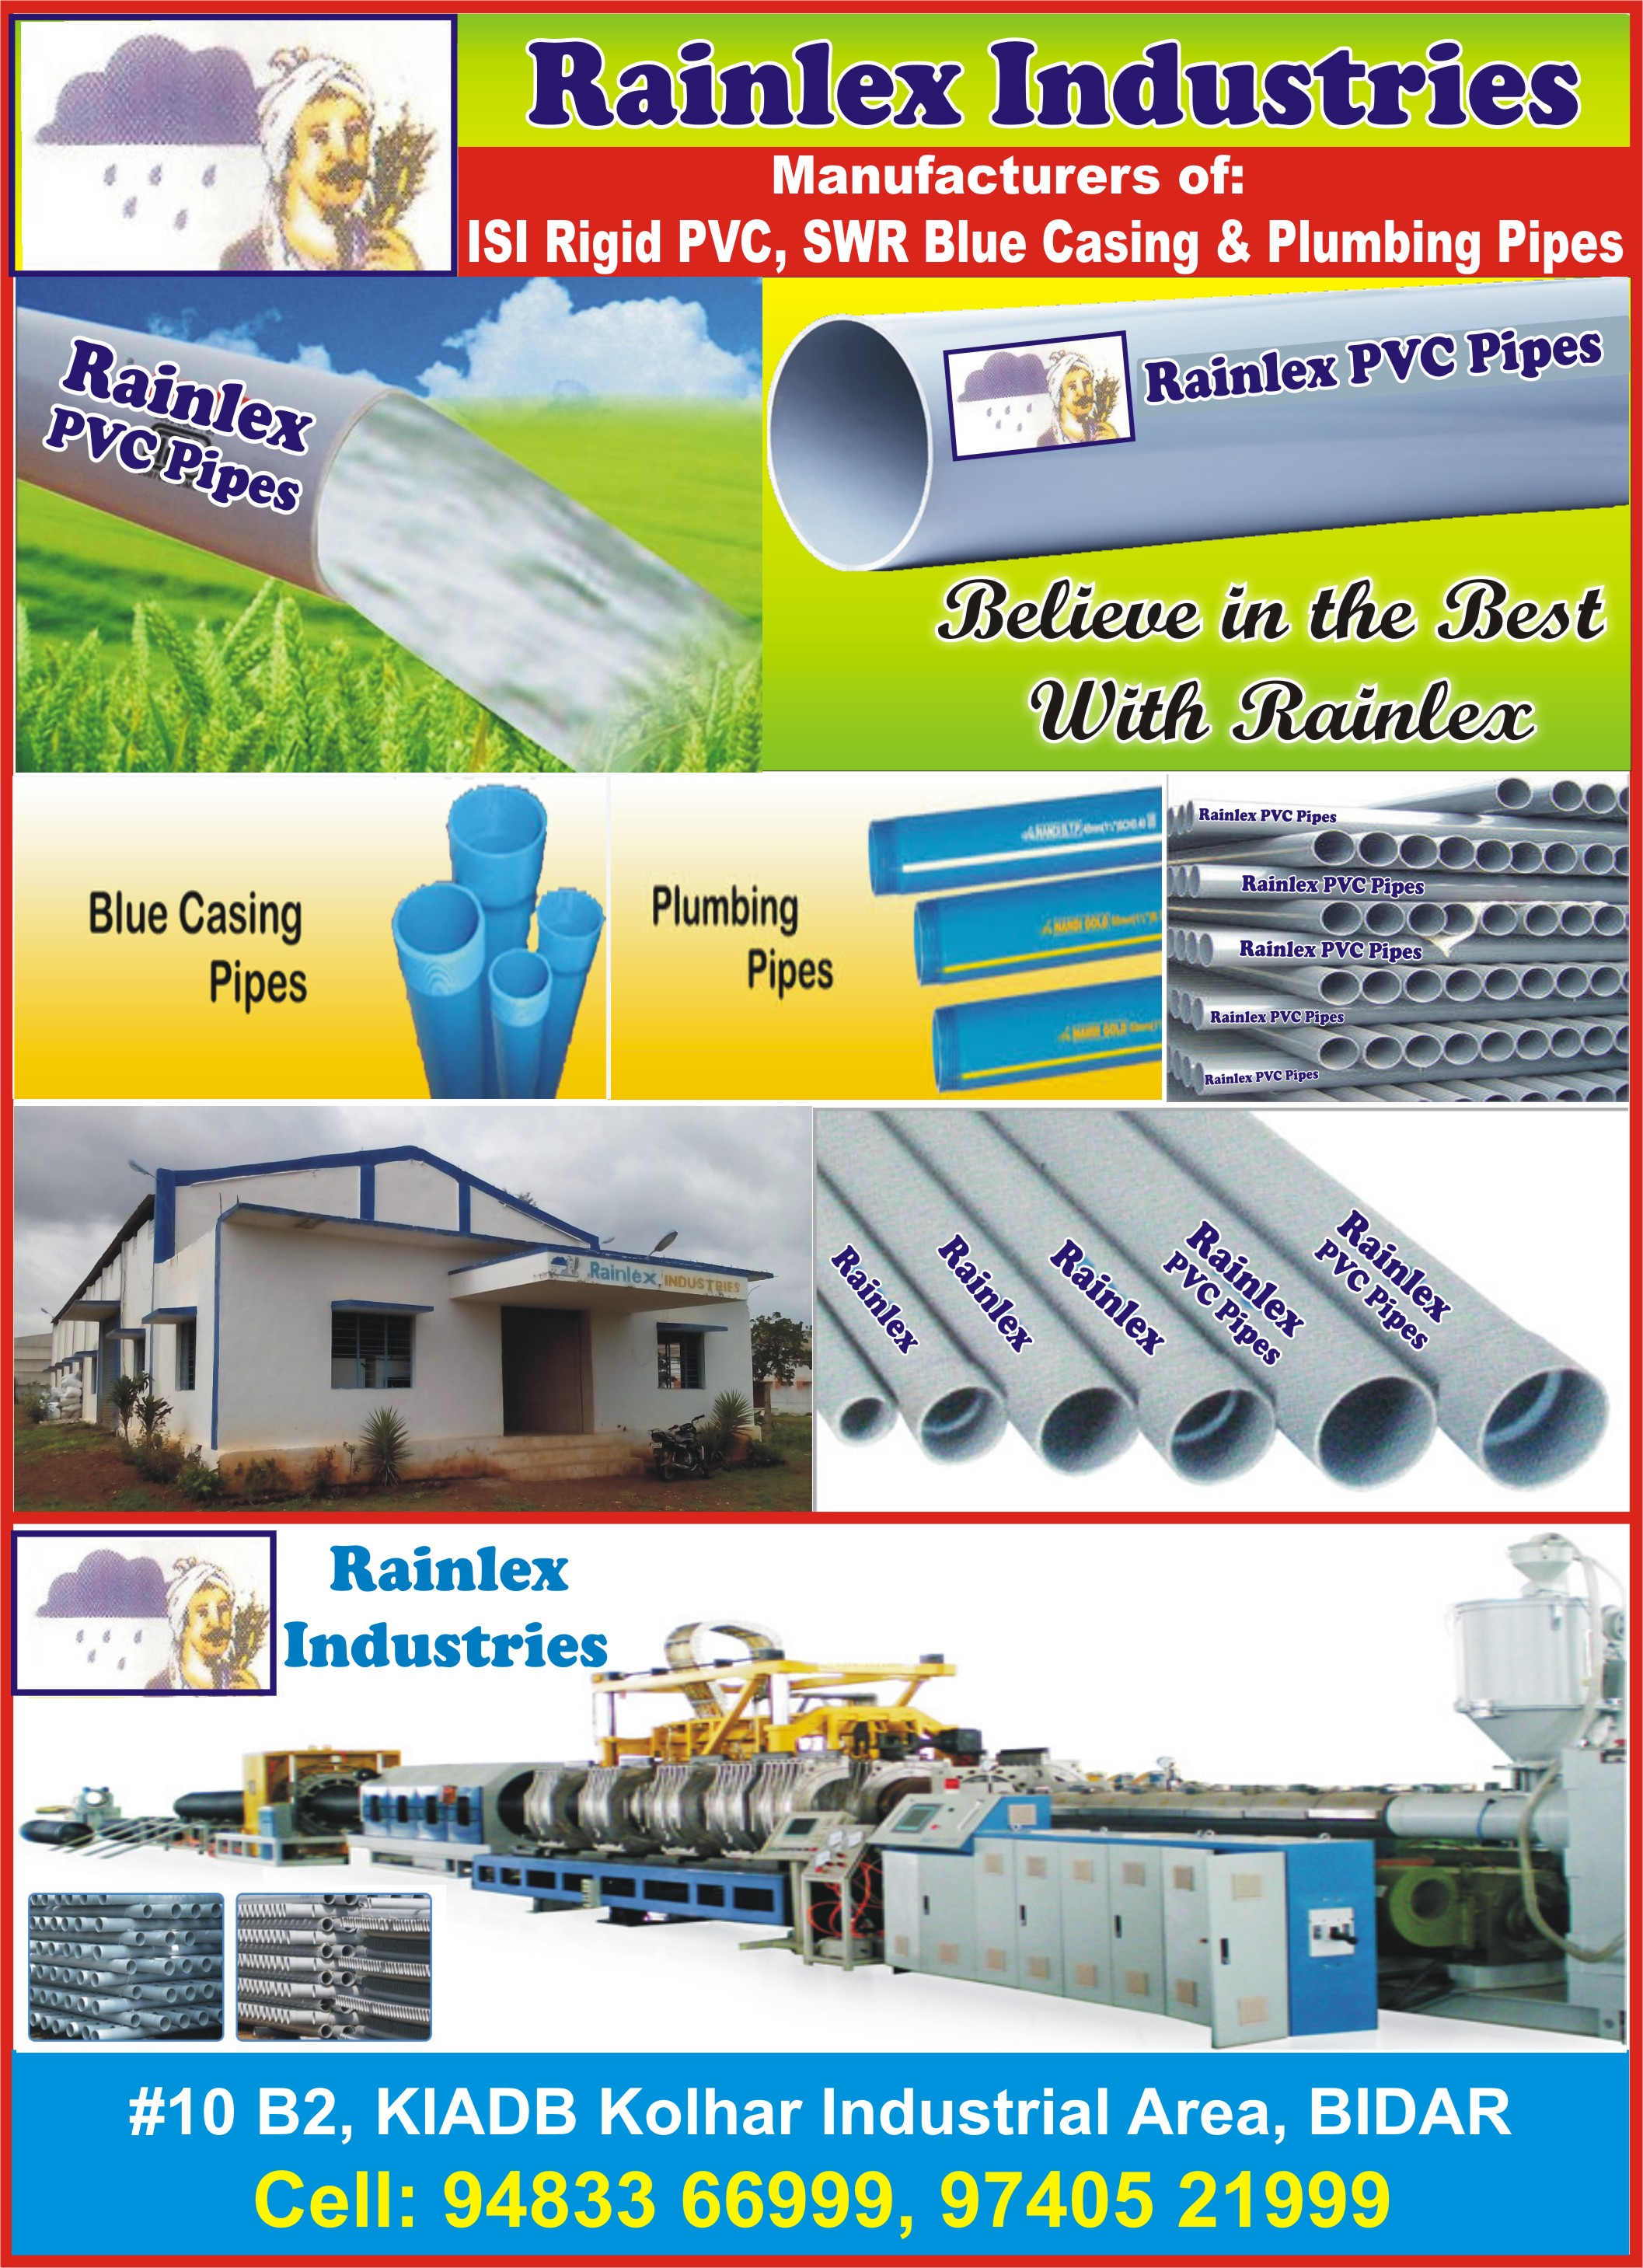 Rainlex Industries